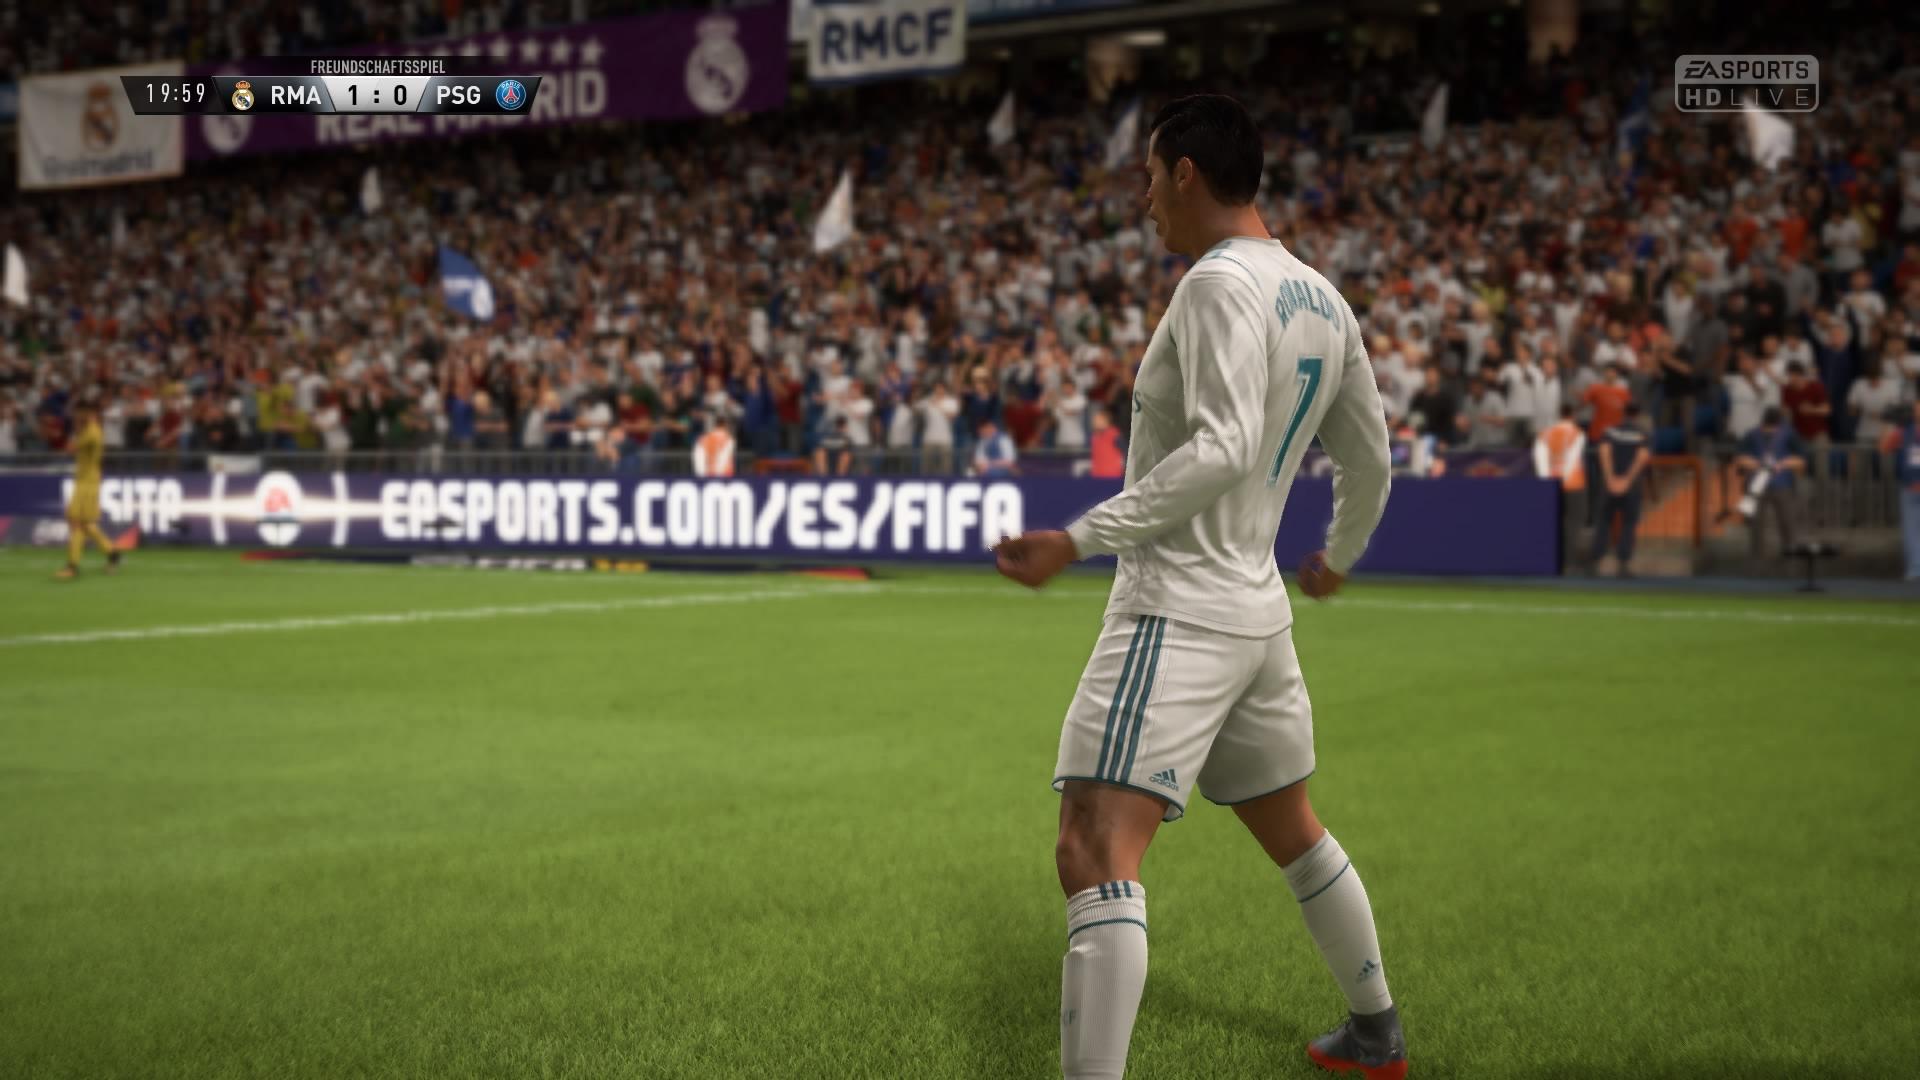 FIFA 18 DEMO Anstoß 1:0 RMA : PSG, 1.HZ